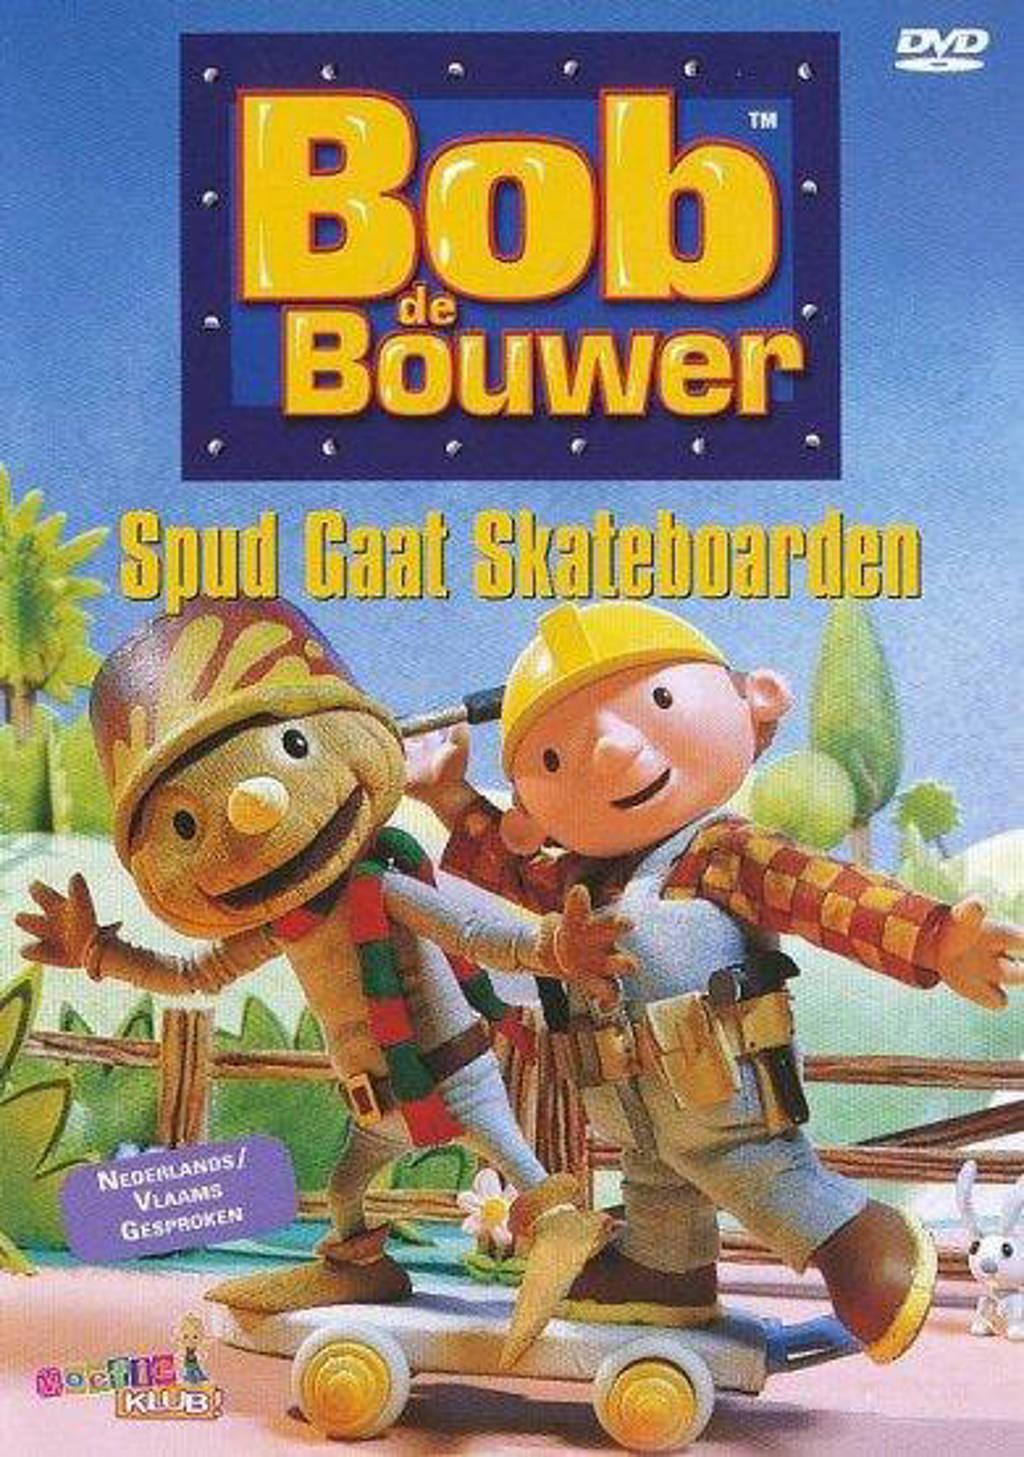 Bob de bouwer - Spud gaat skateboarden (DVD)